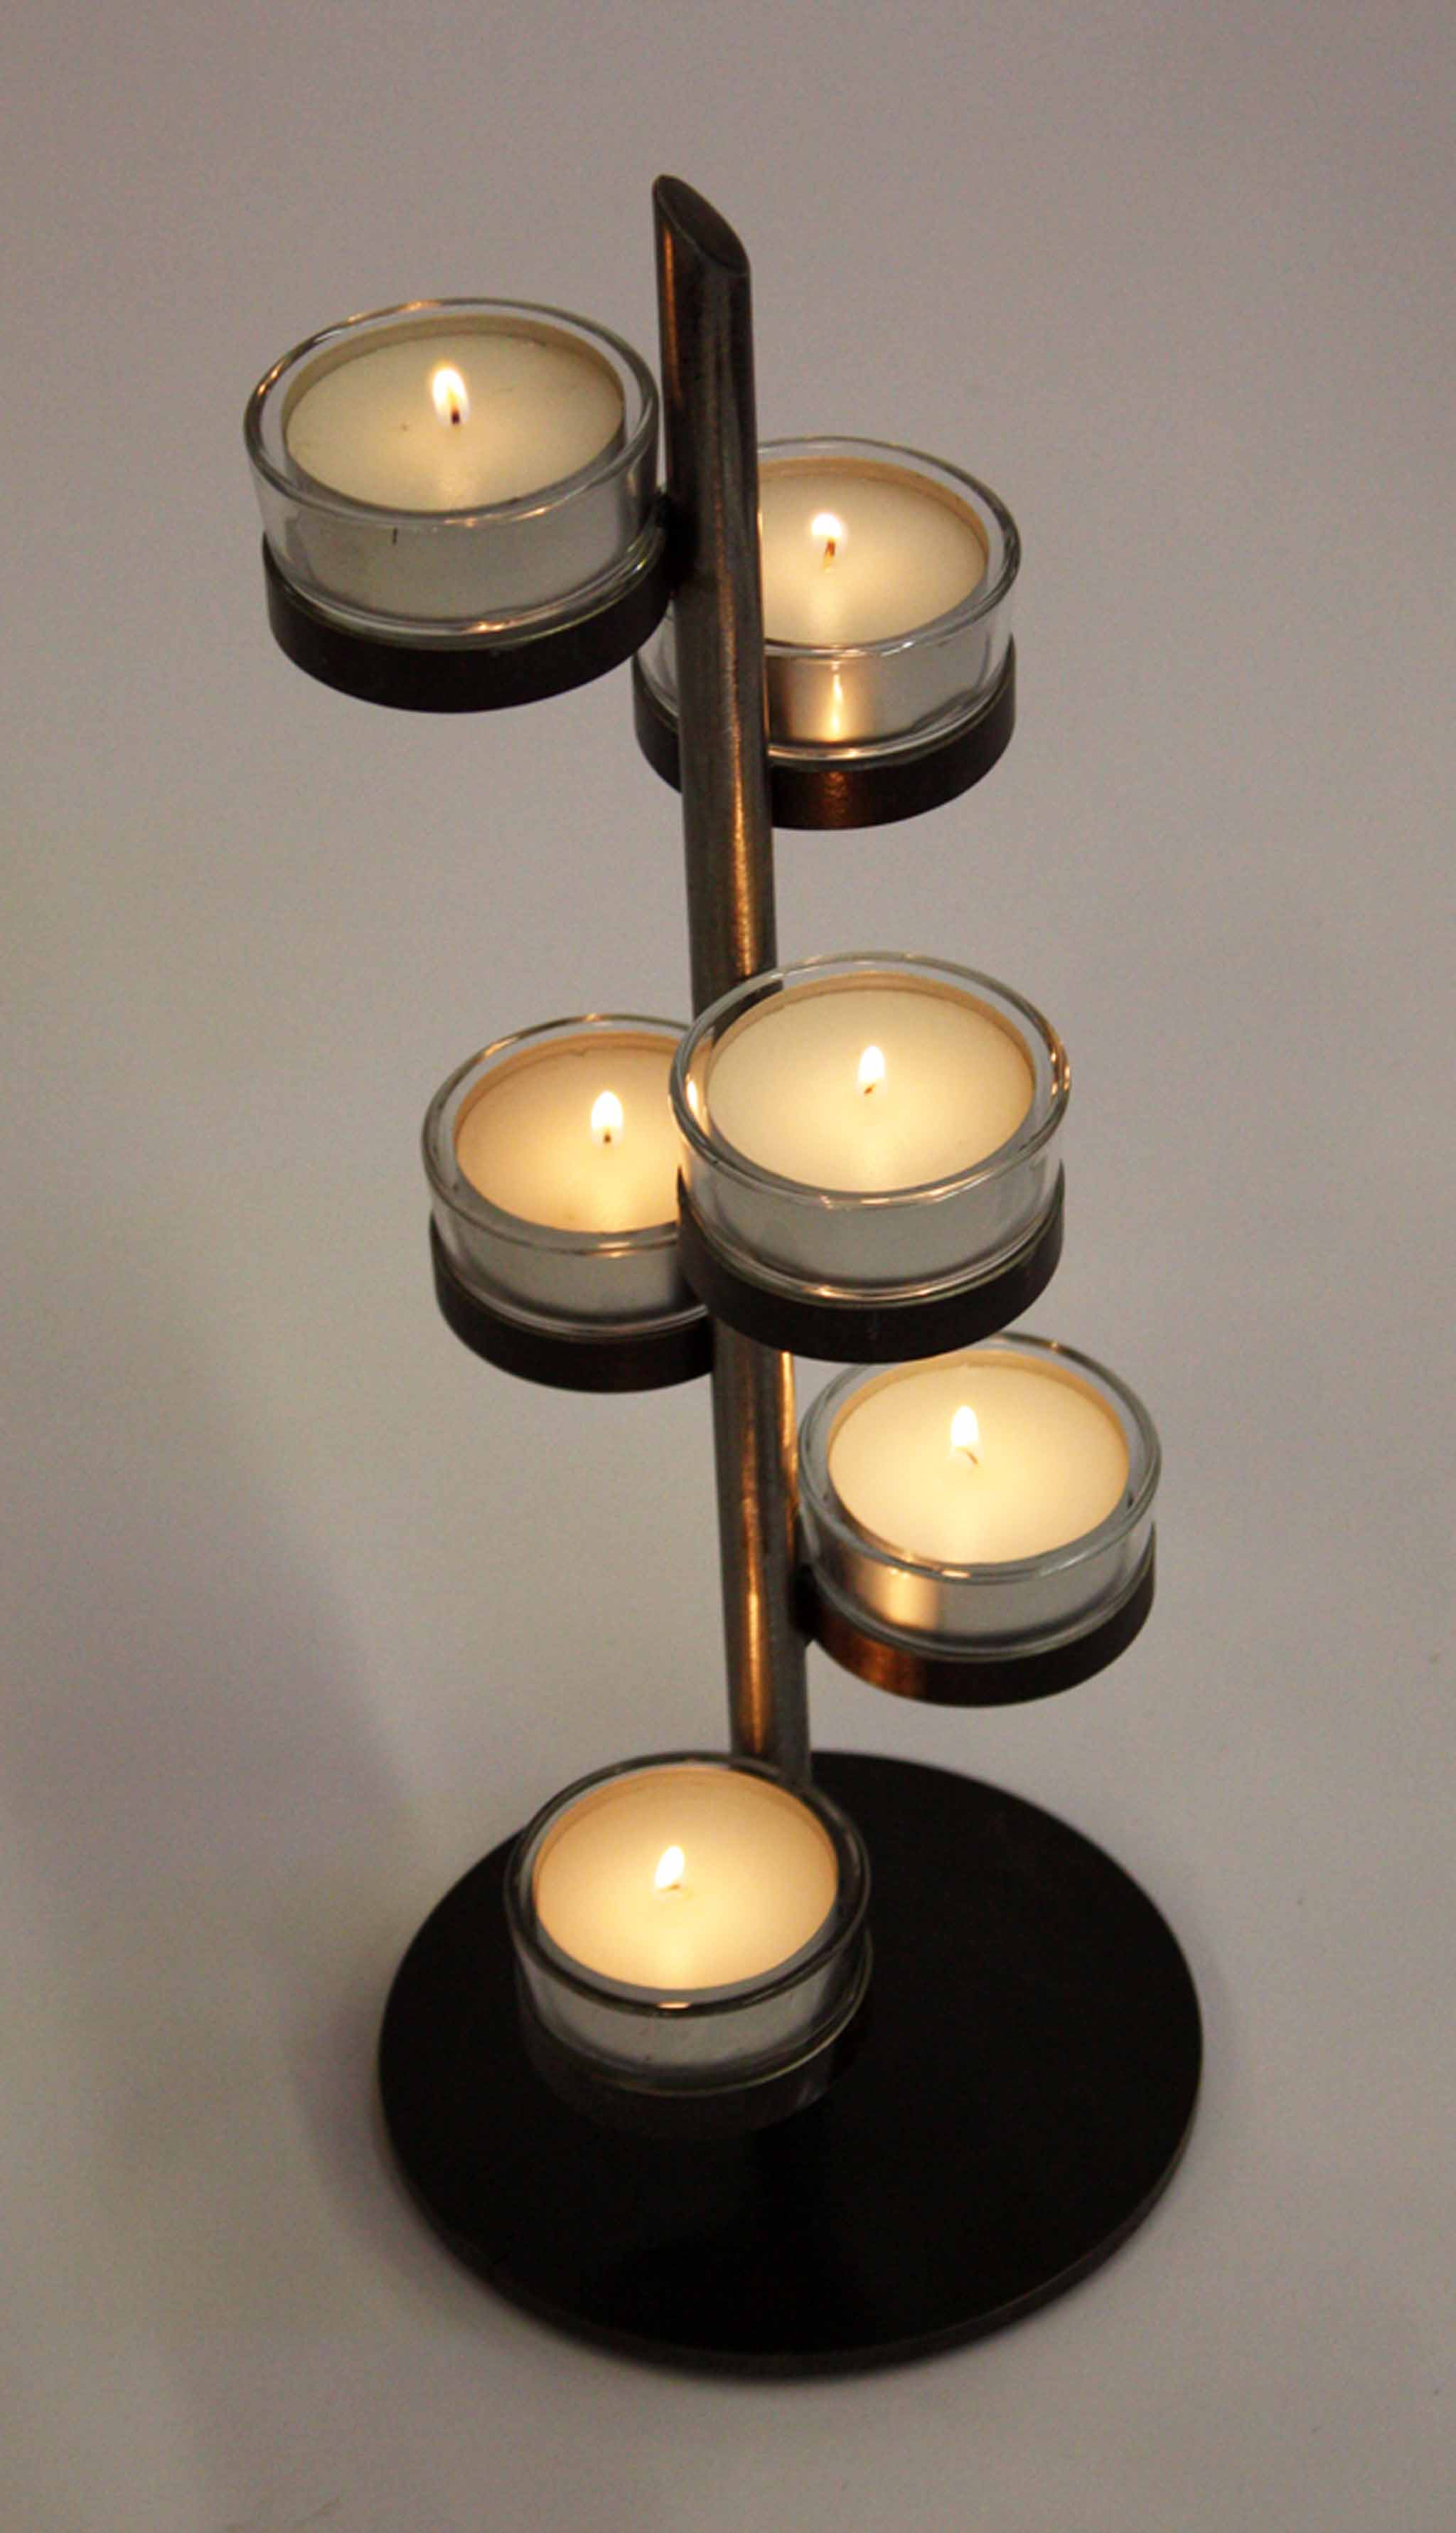 metal modern tabletop candelabra